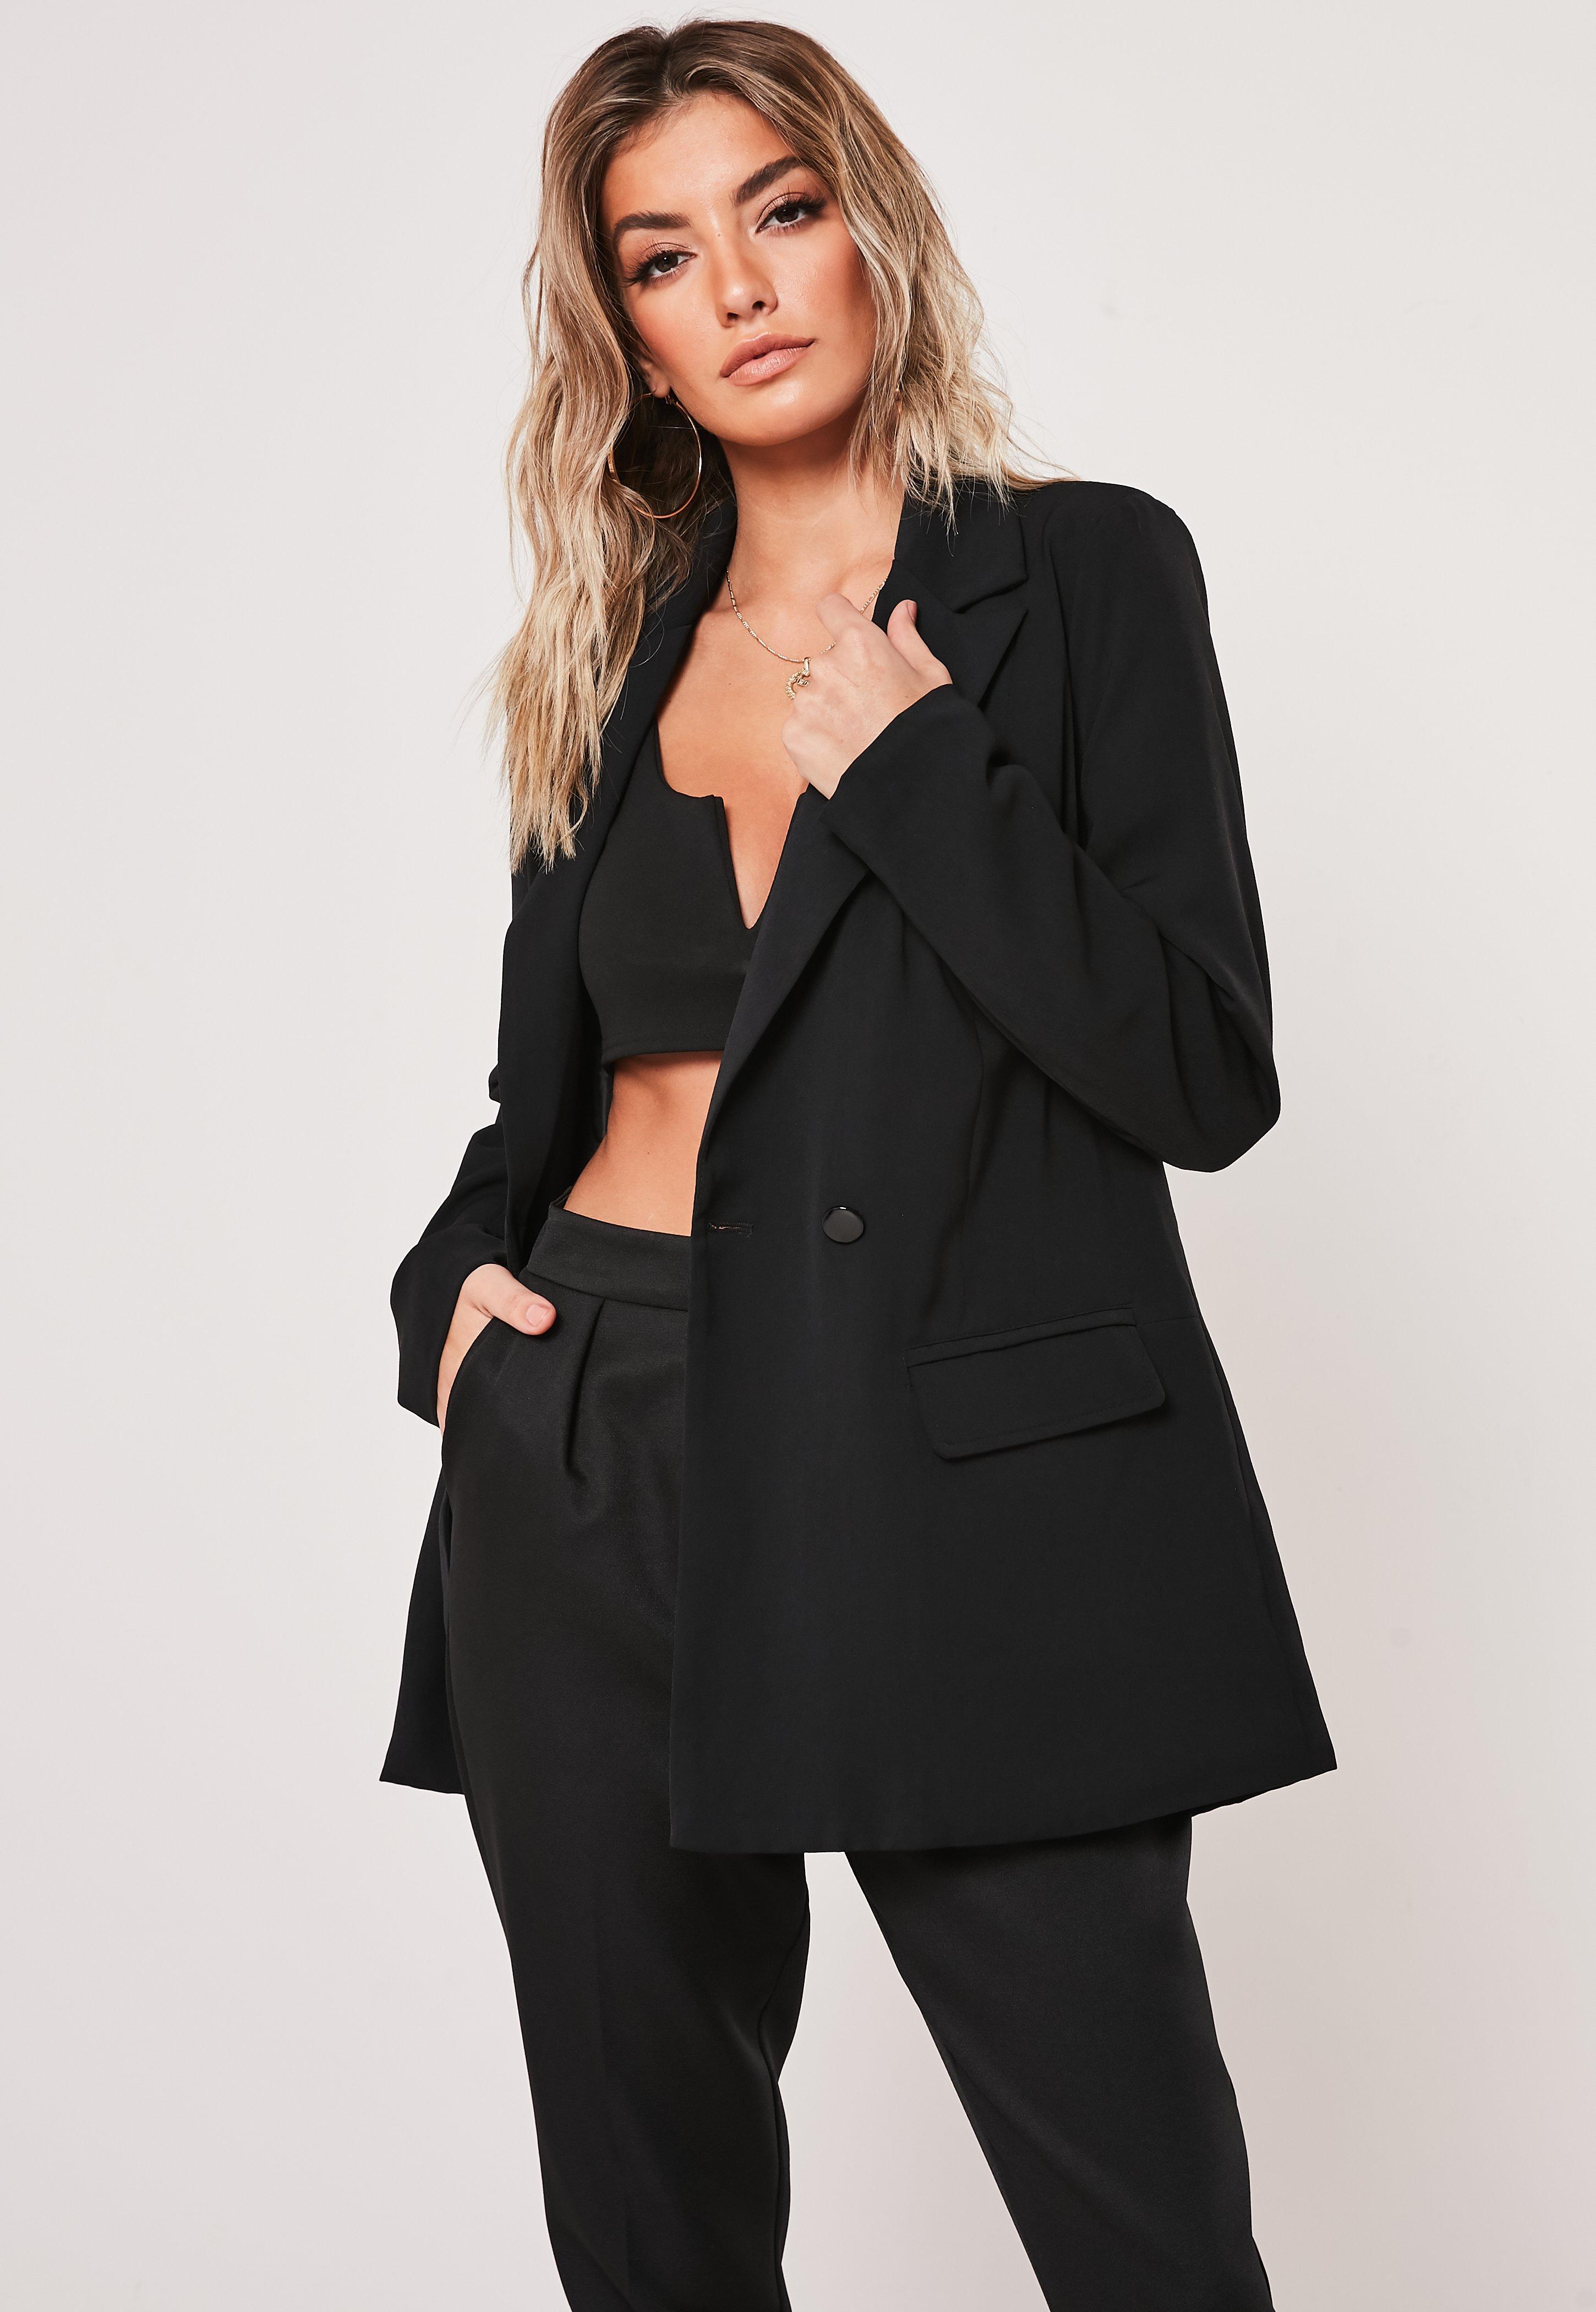 Top 20 tailored women blazers